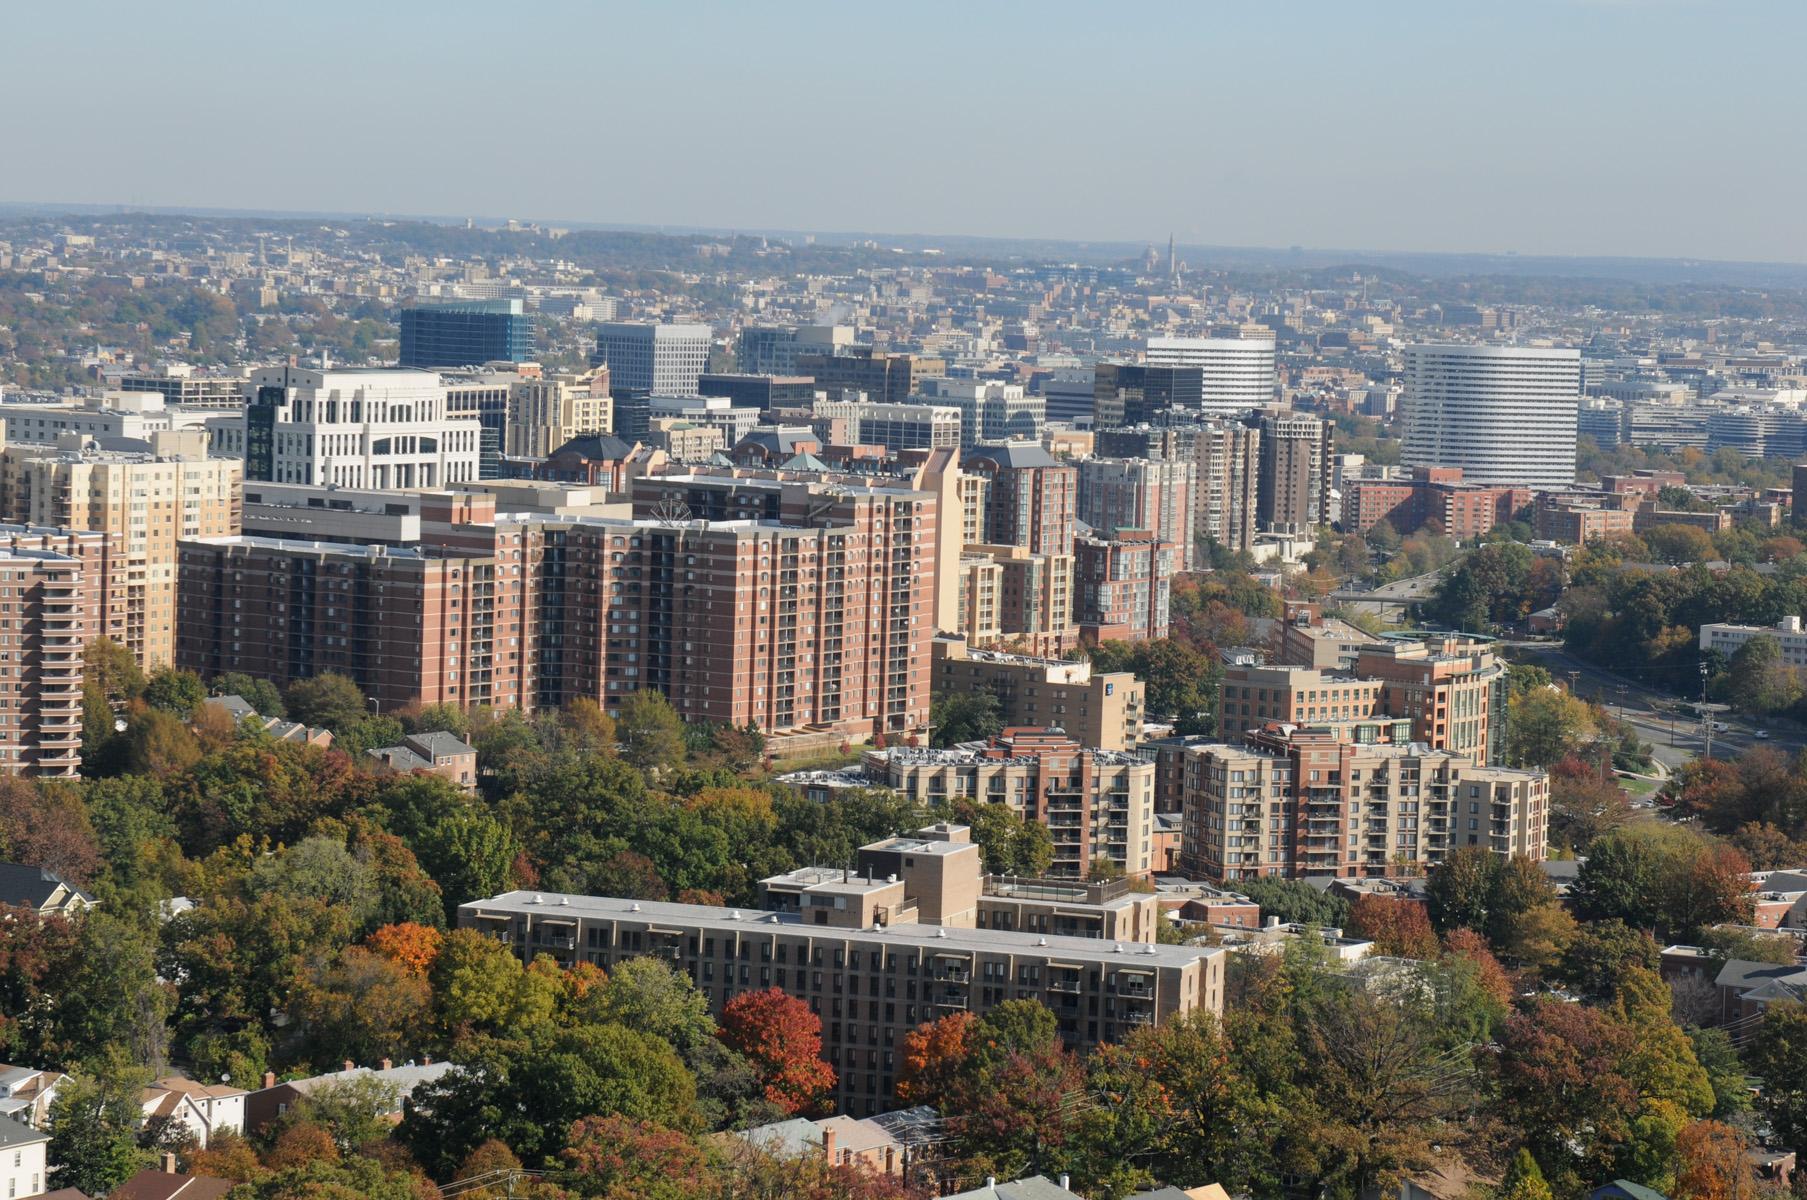 File:Arlington County - Virginia - 2.jpg - Wikimedia Commons